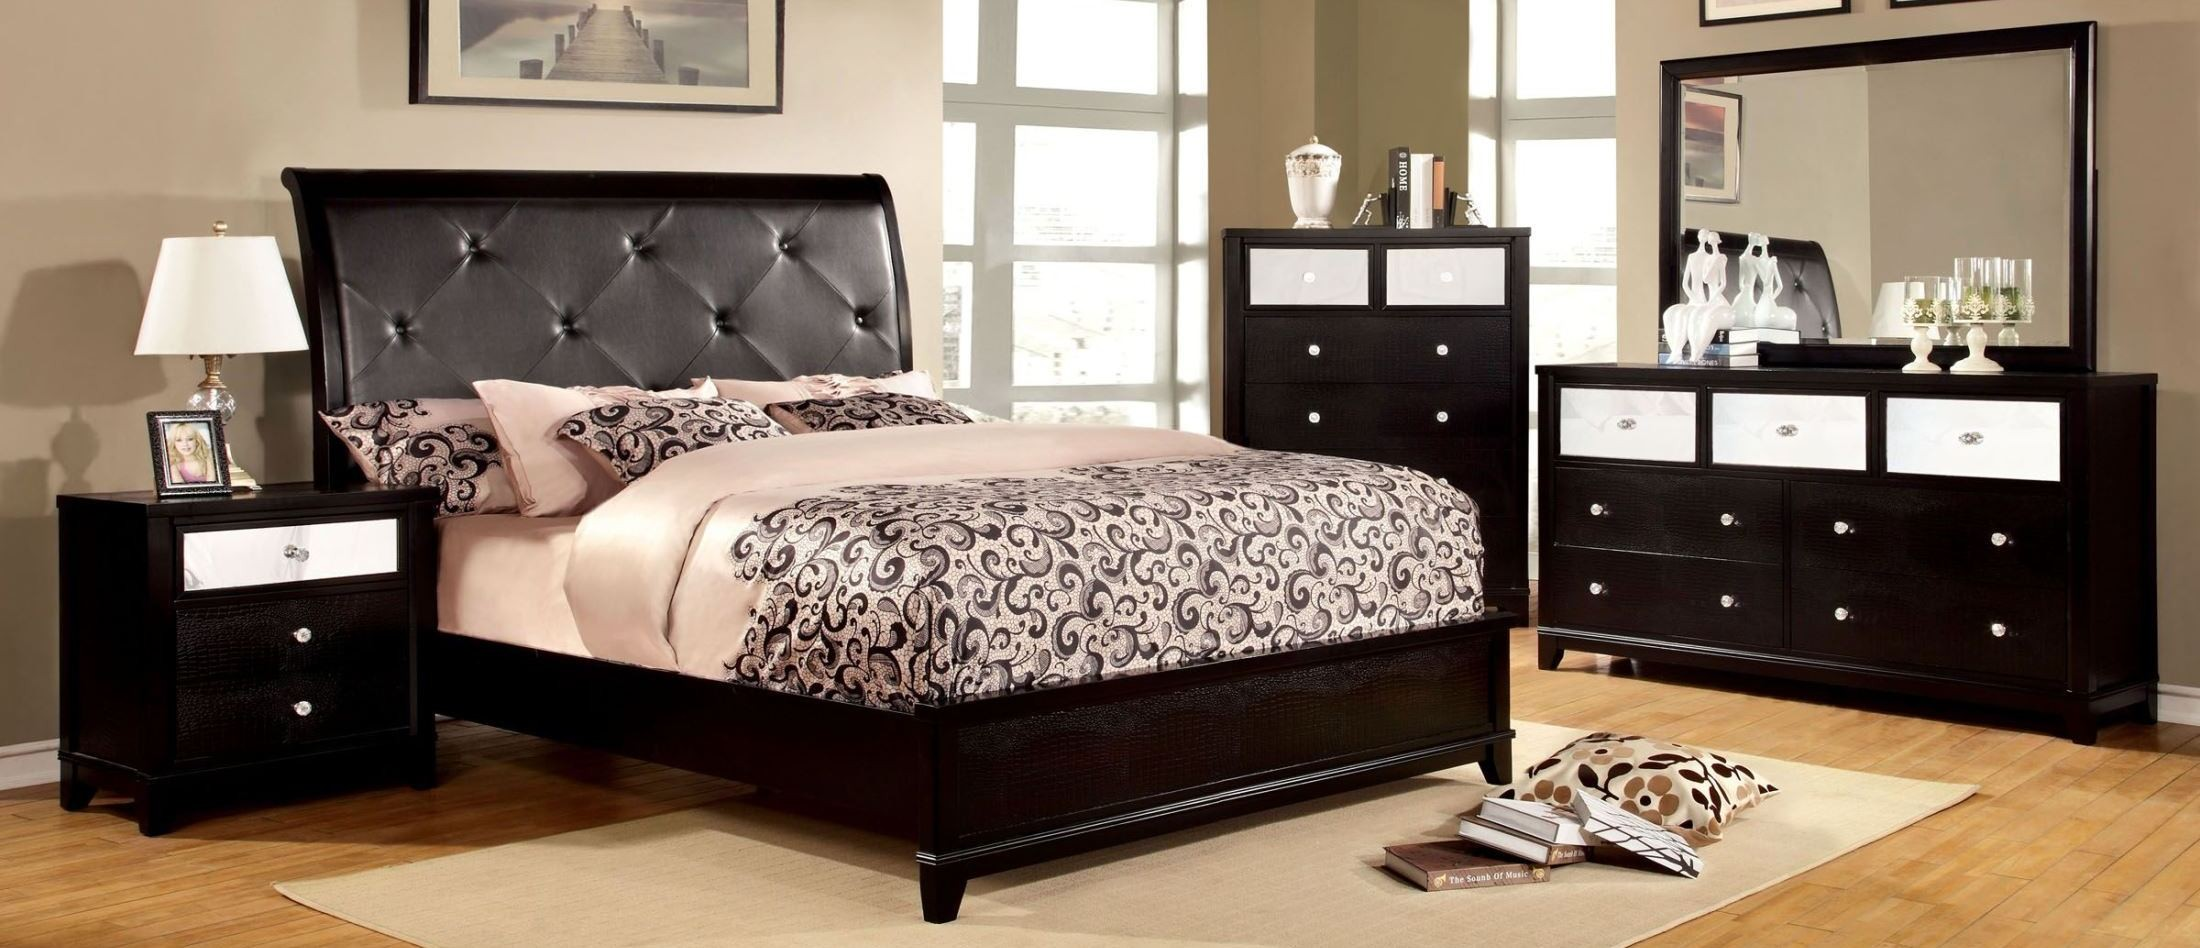 Bryant black crocodile leatherette bedroom set from furniture of america cm7288q bed coleman - Black bedroom furniture ...